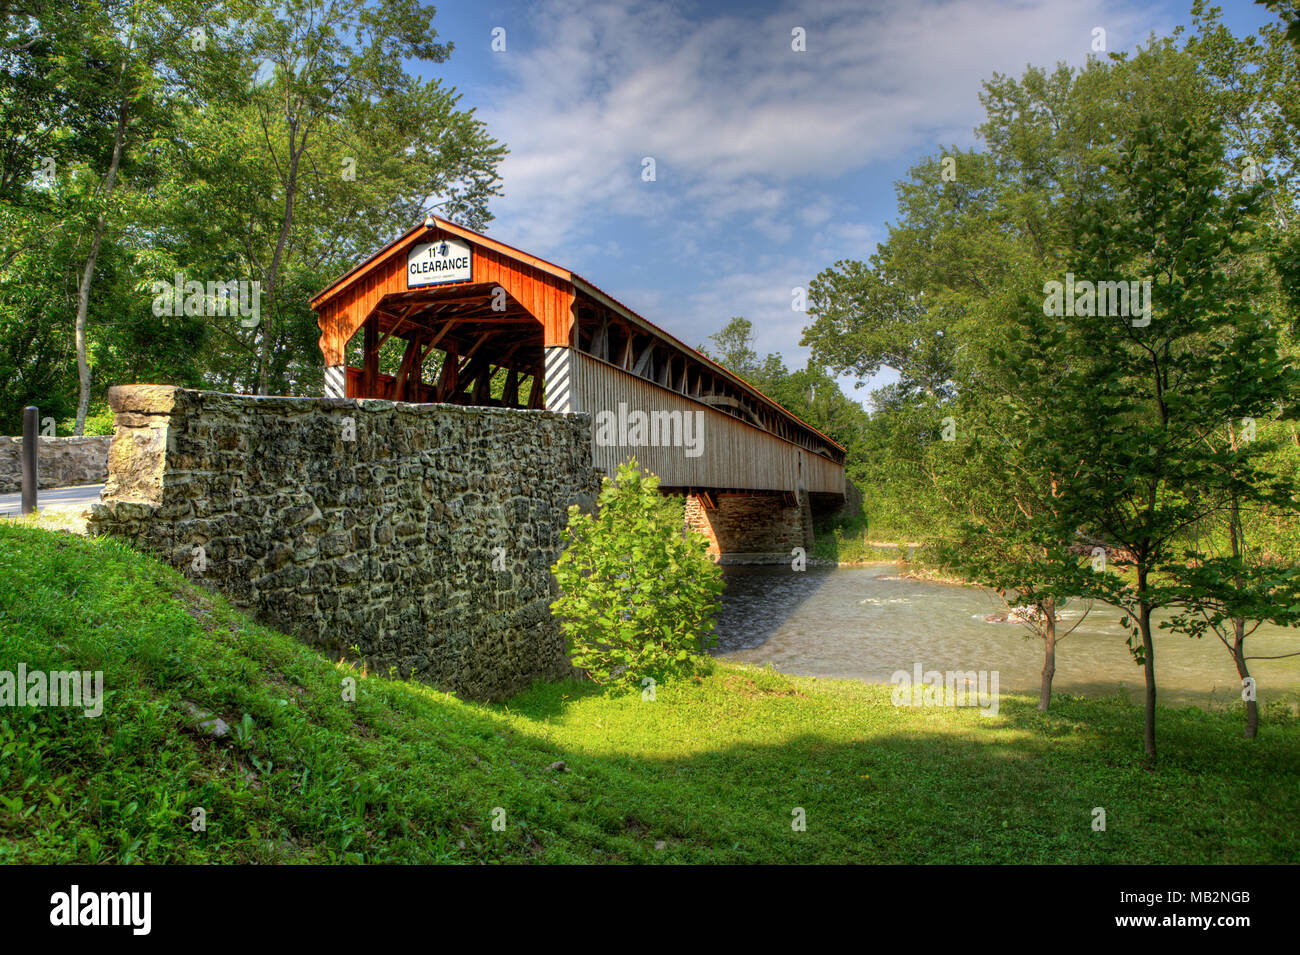 The Academia Covered Bridge in Pennsylvania - Stock Image